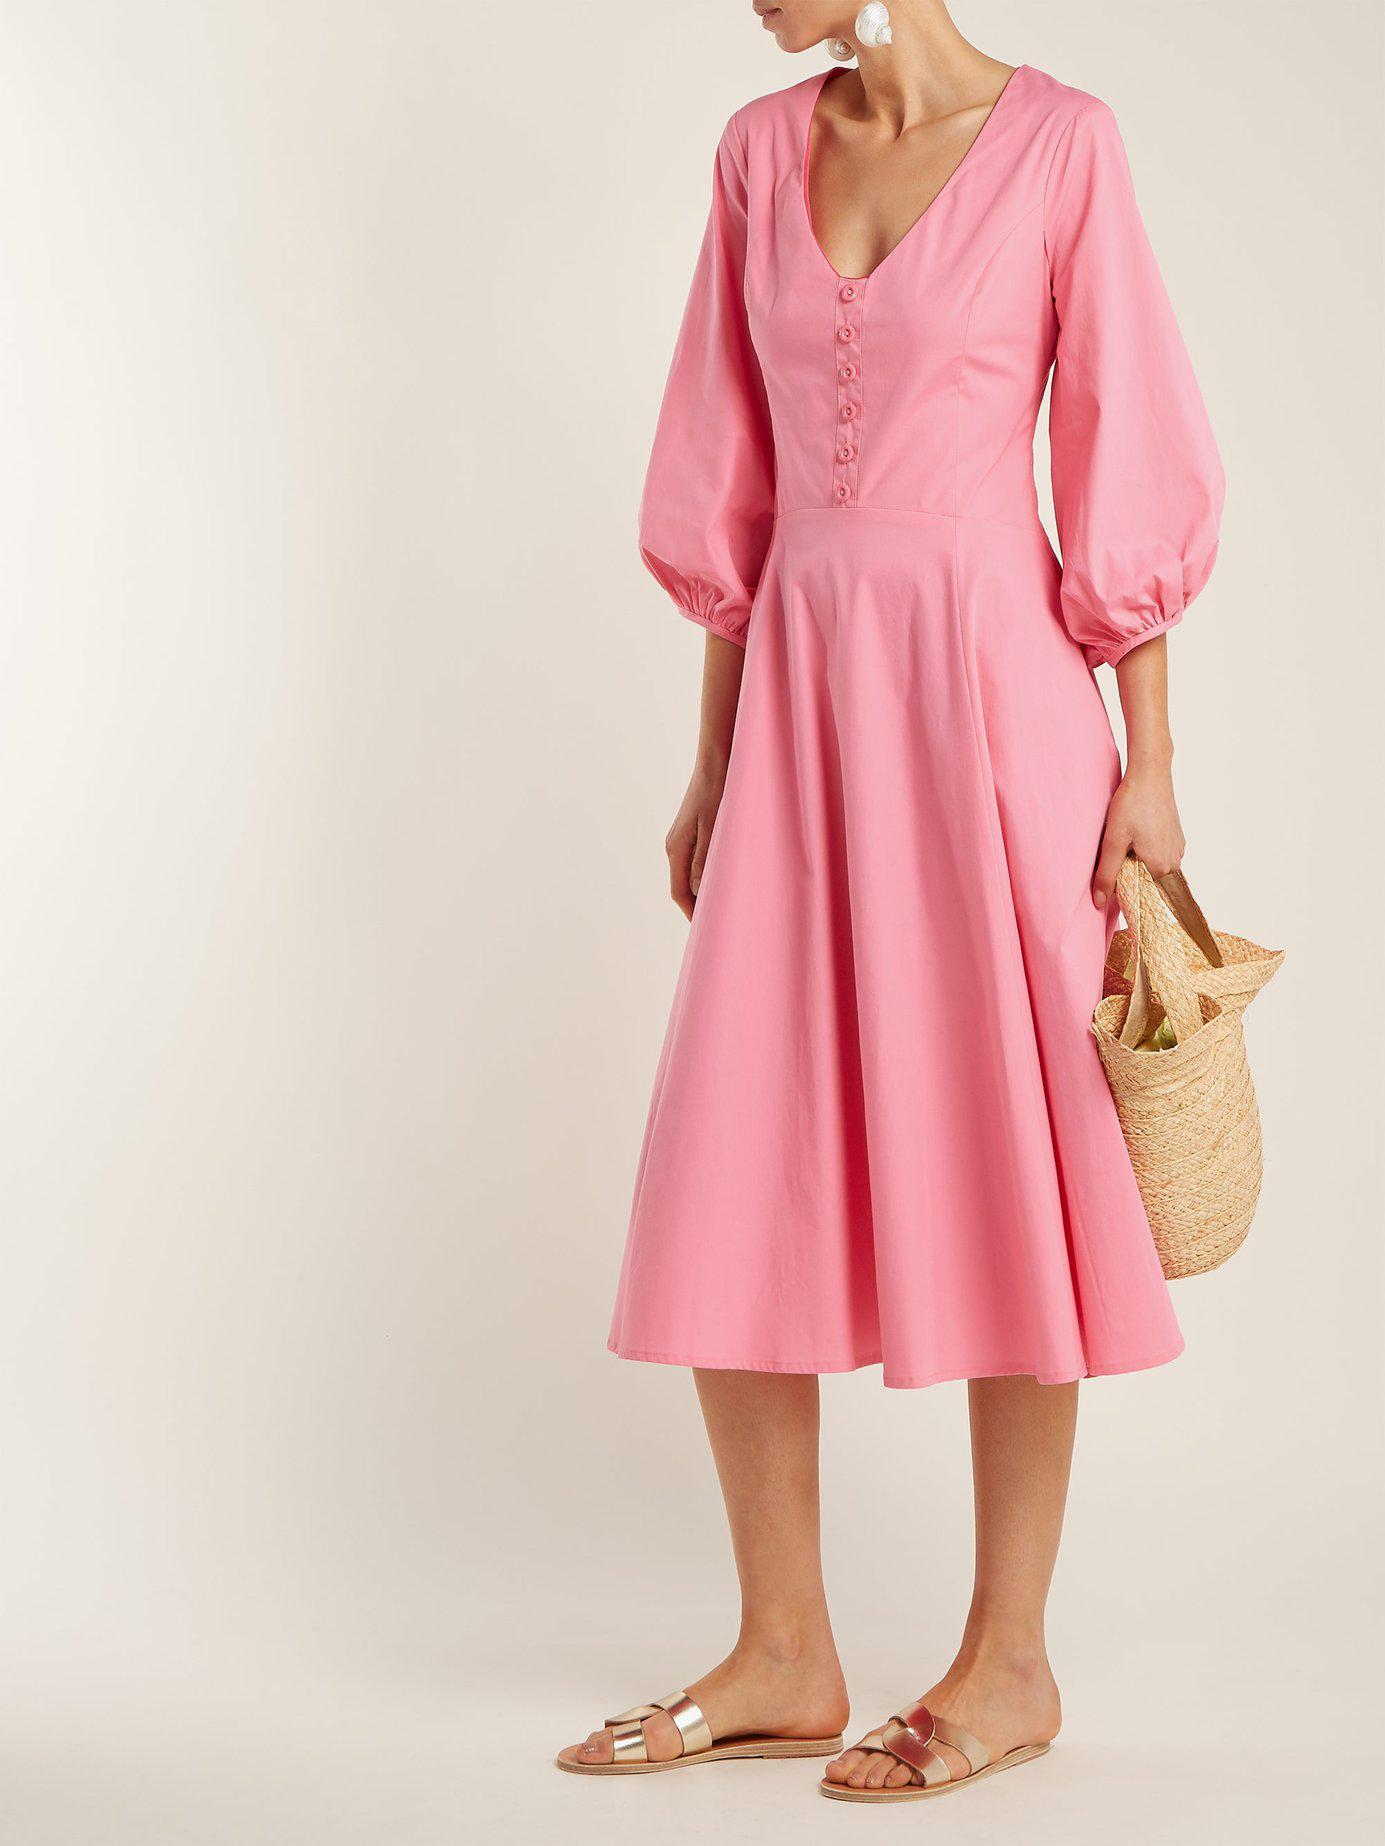 STAUD Veronica Cotton Poplin Midi Dress in Pink   Lyst